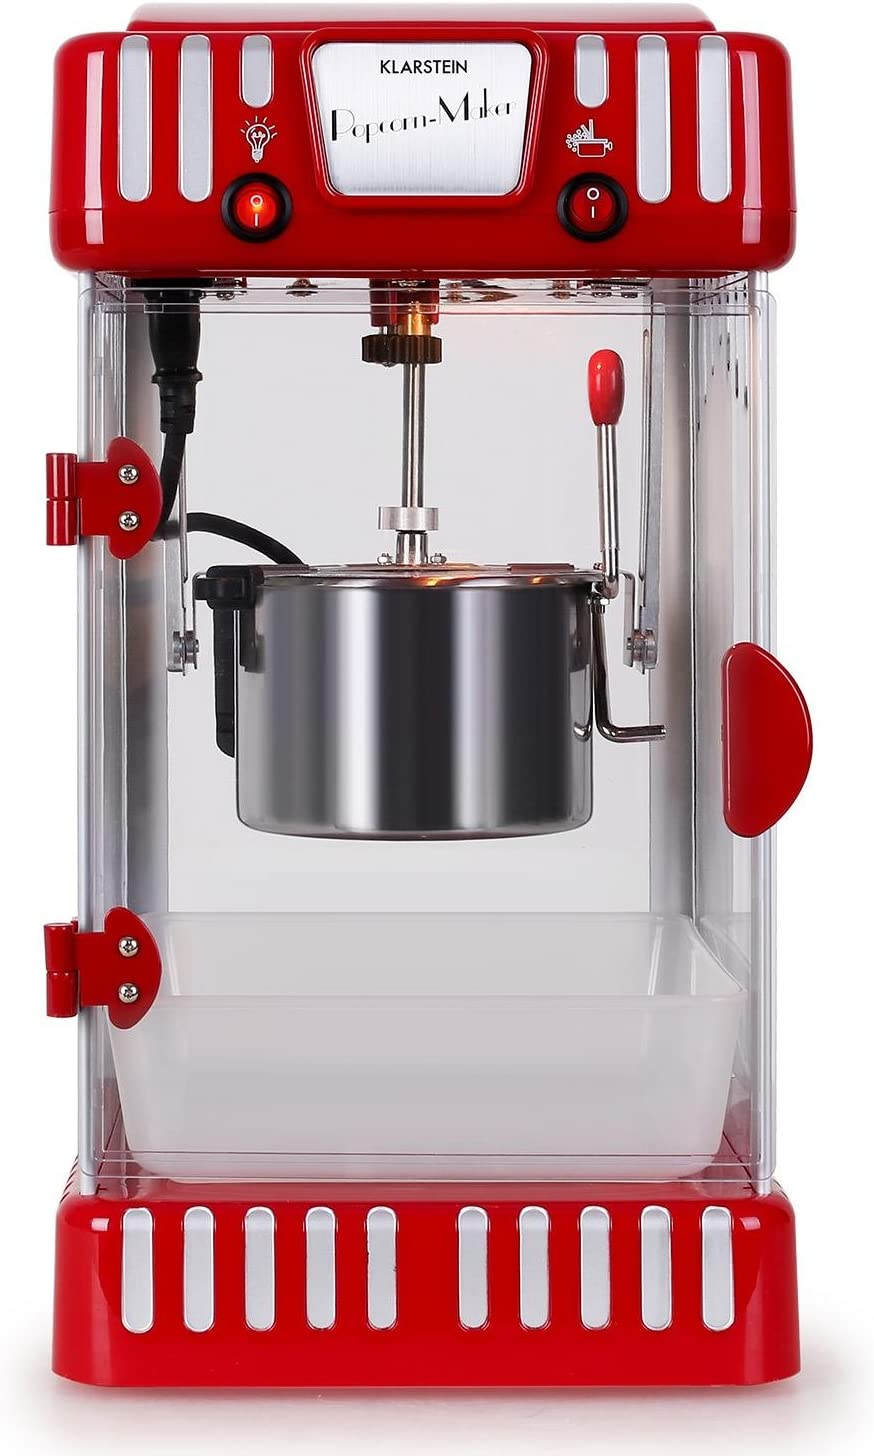 Klarstein Volcano Retro Pop Corn Machine with Removable Stainless Steel Bowl red